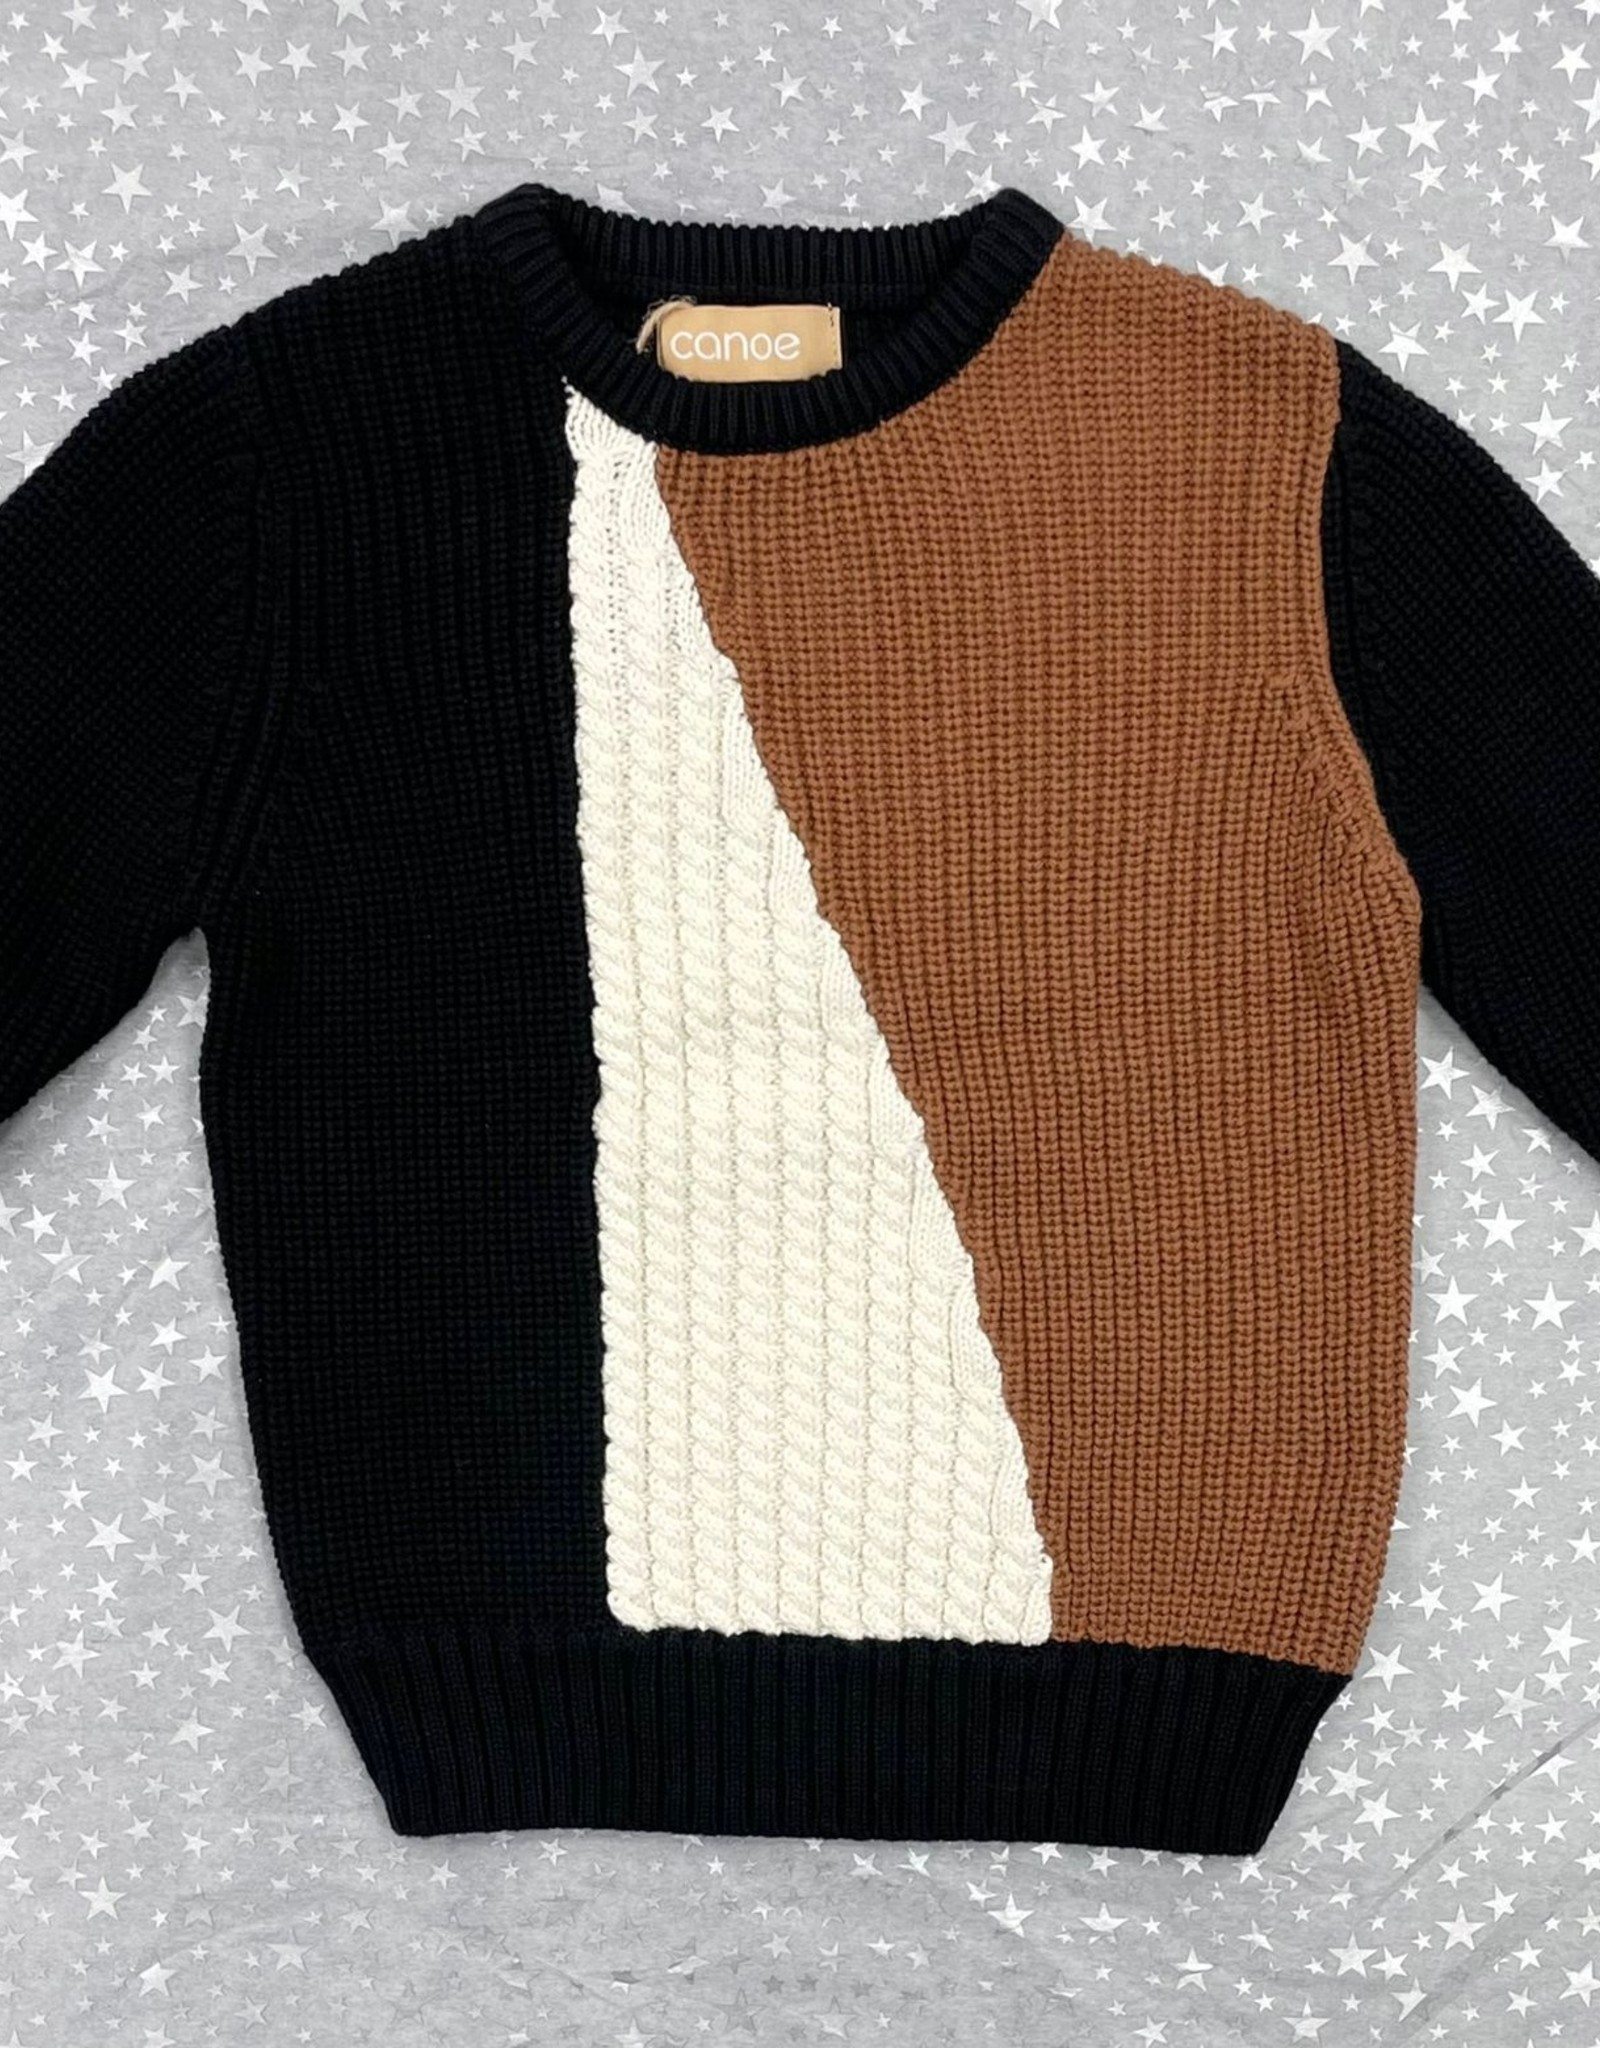 Canoe Canoe Asymetric Colorblock Knit Crewneck Sweater